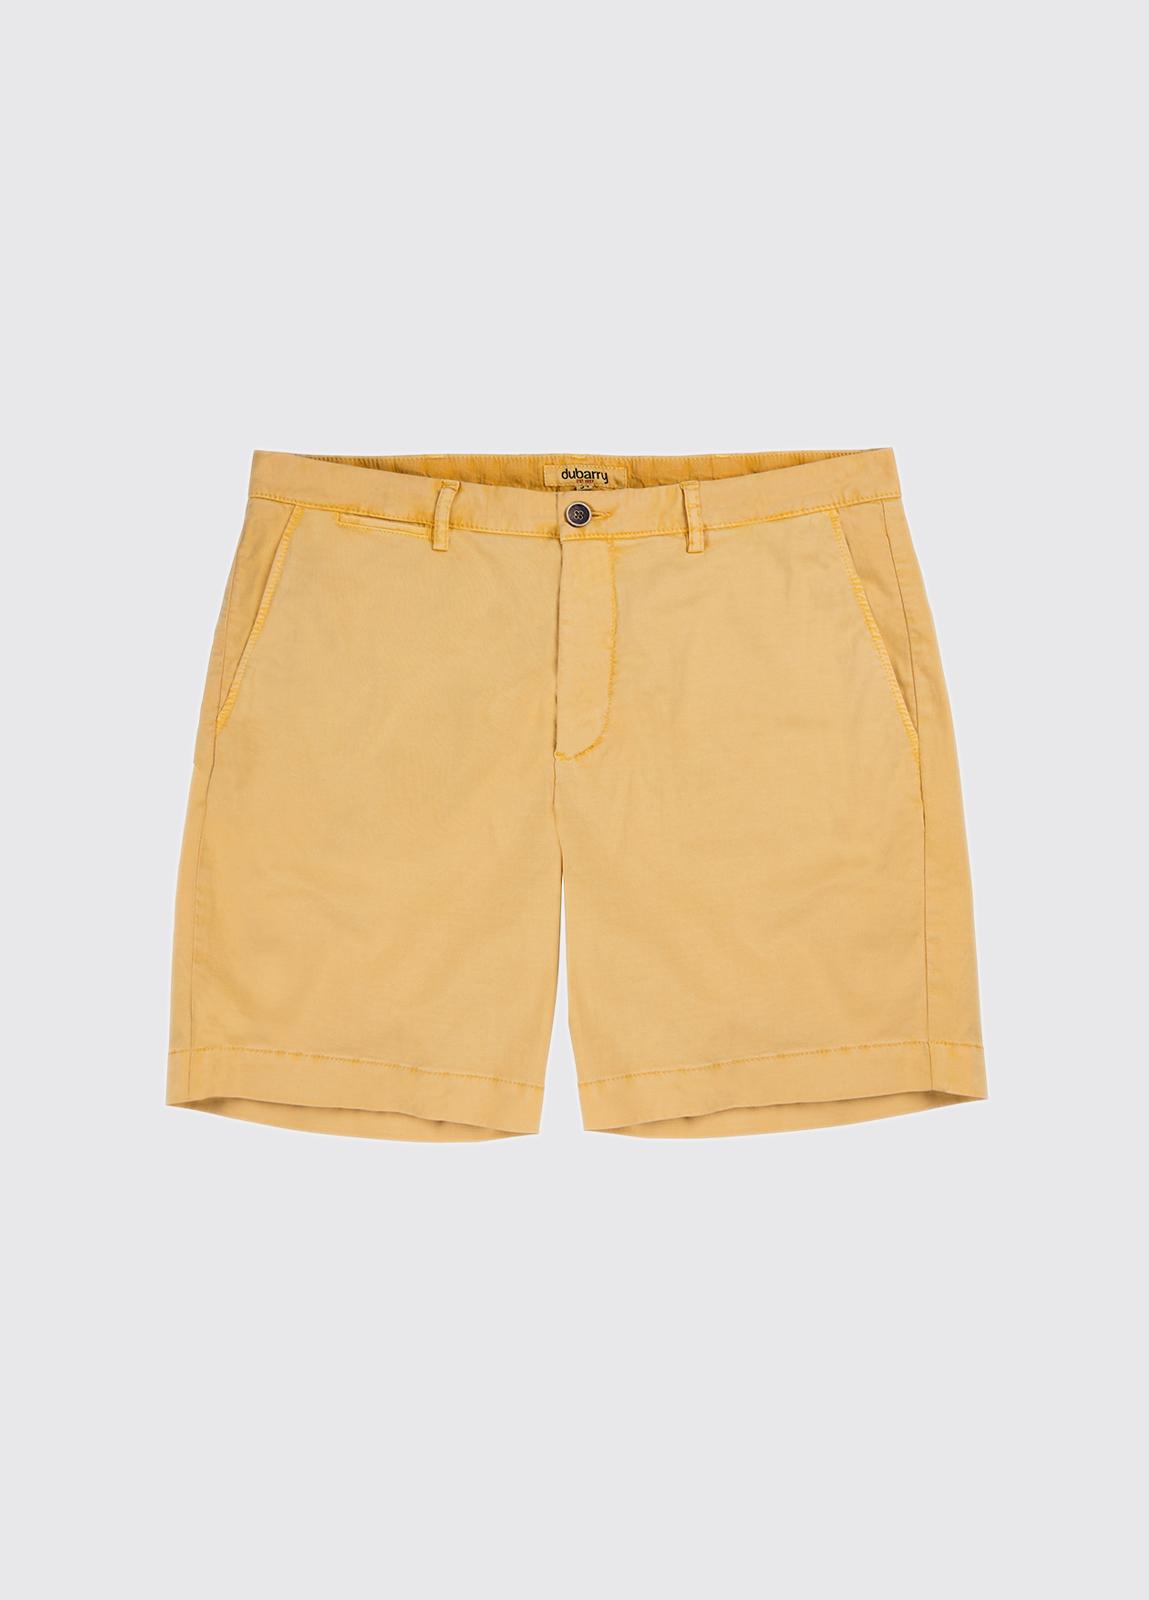 Glandore Men's Shorts - Maize